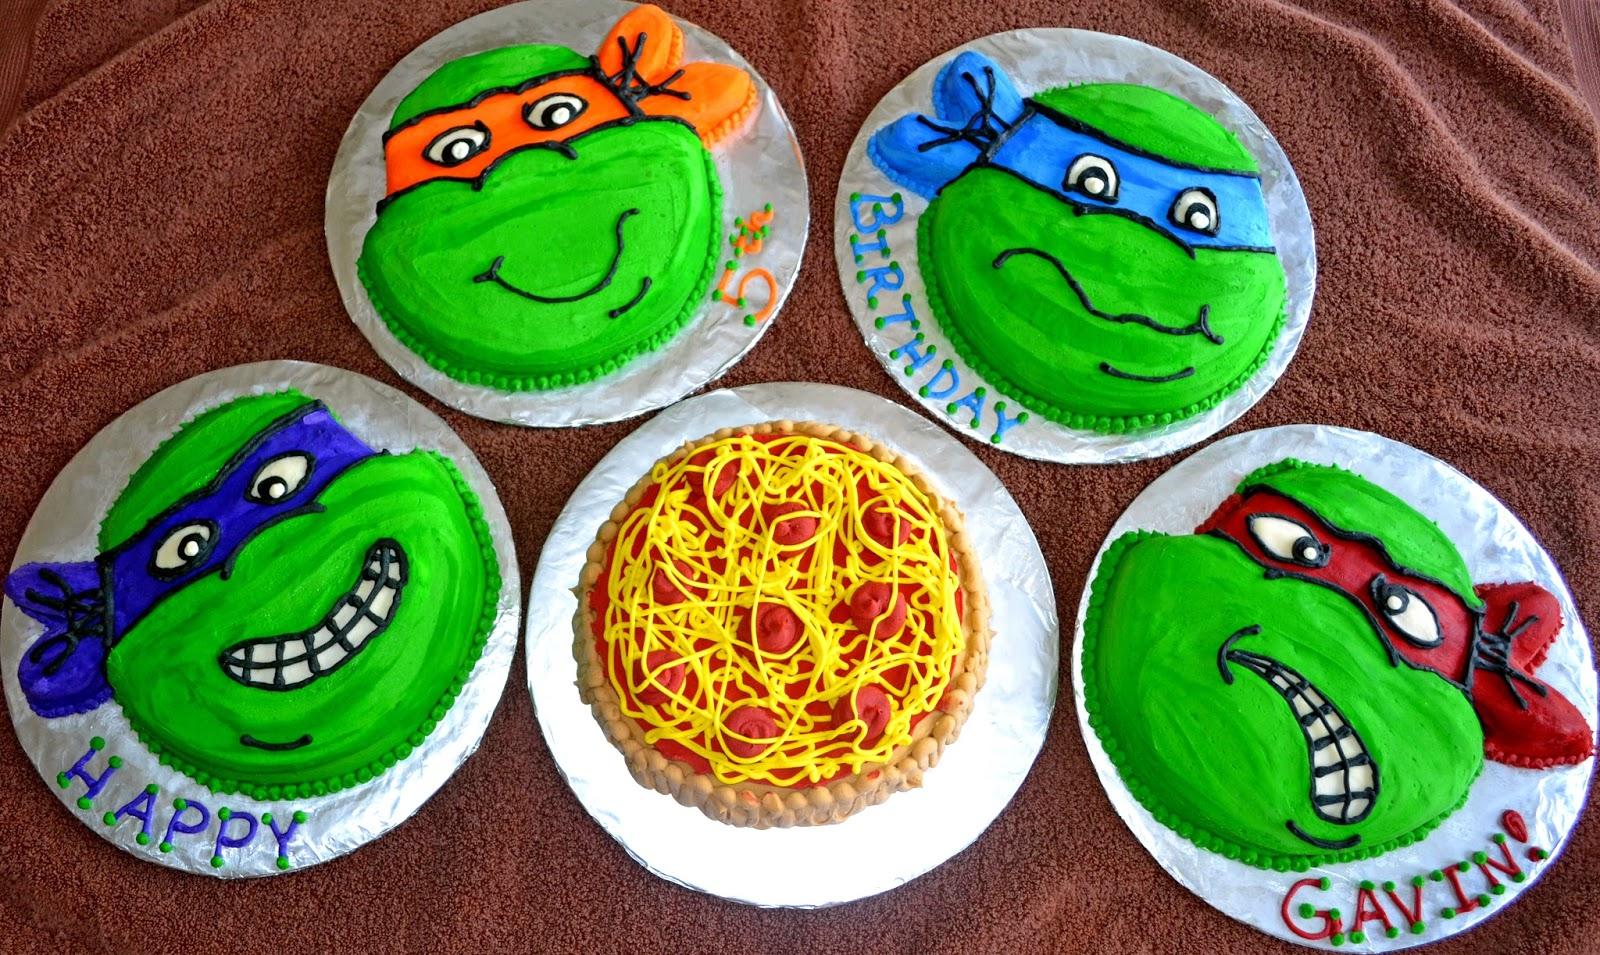 Affordable Cakes By Tiffany Teenage Mutant Ninja Turtles Cakes